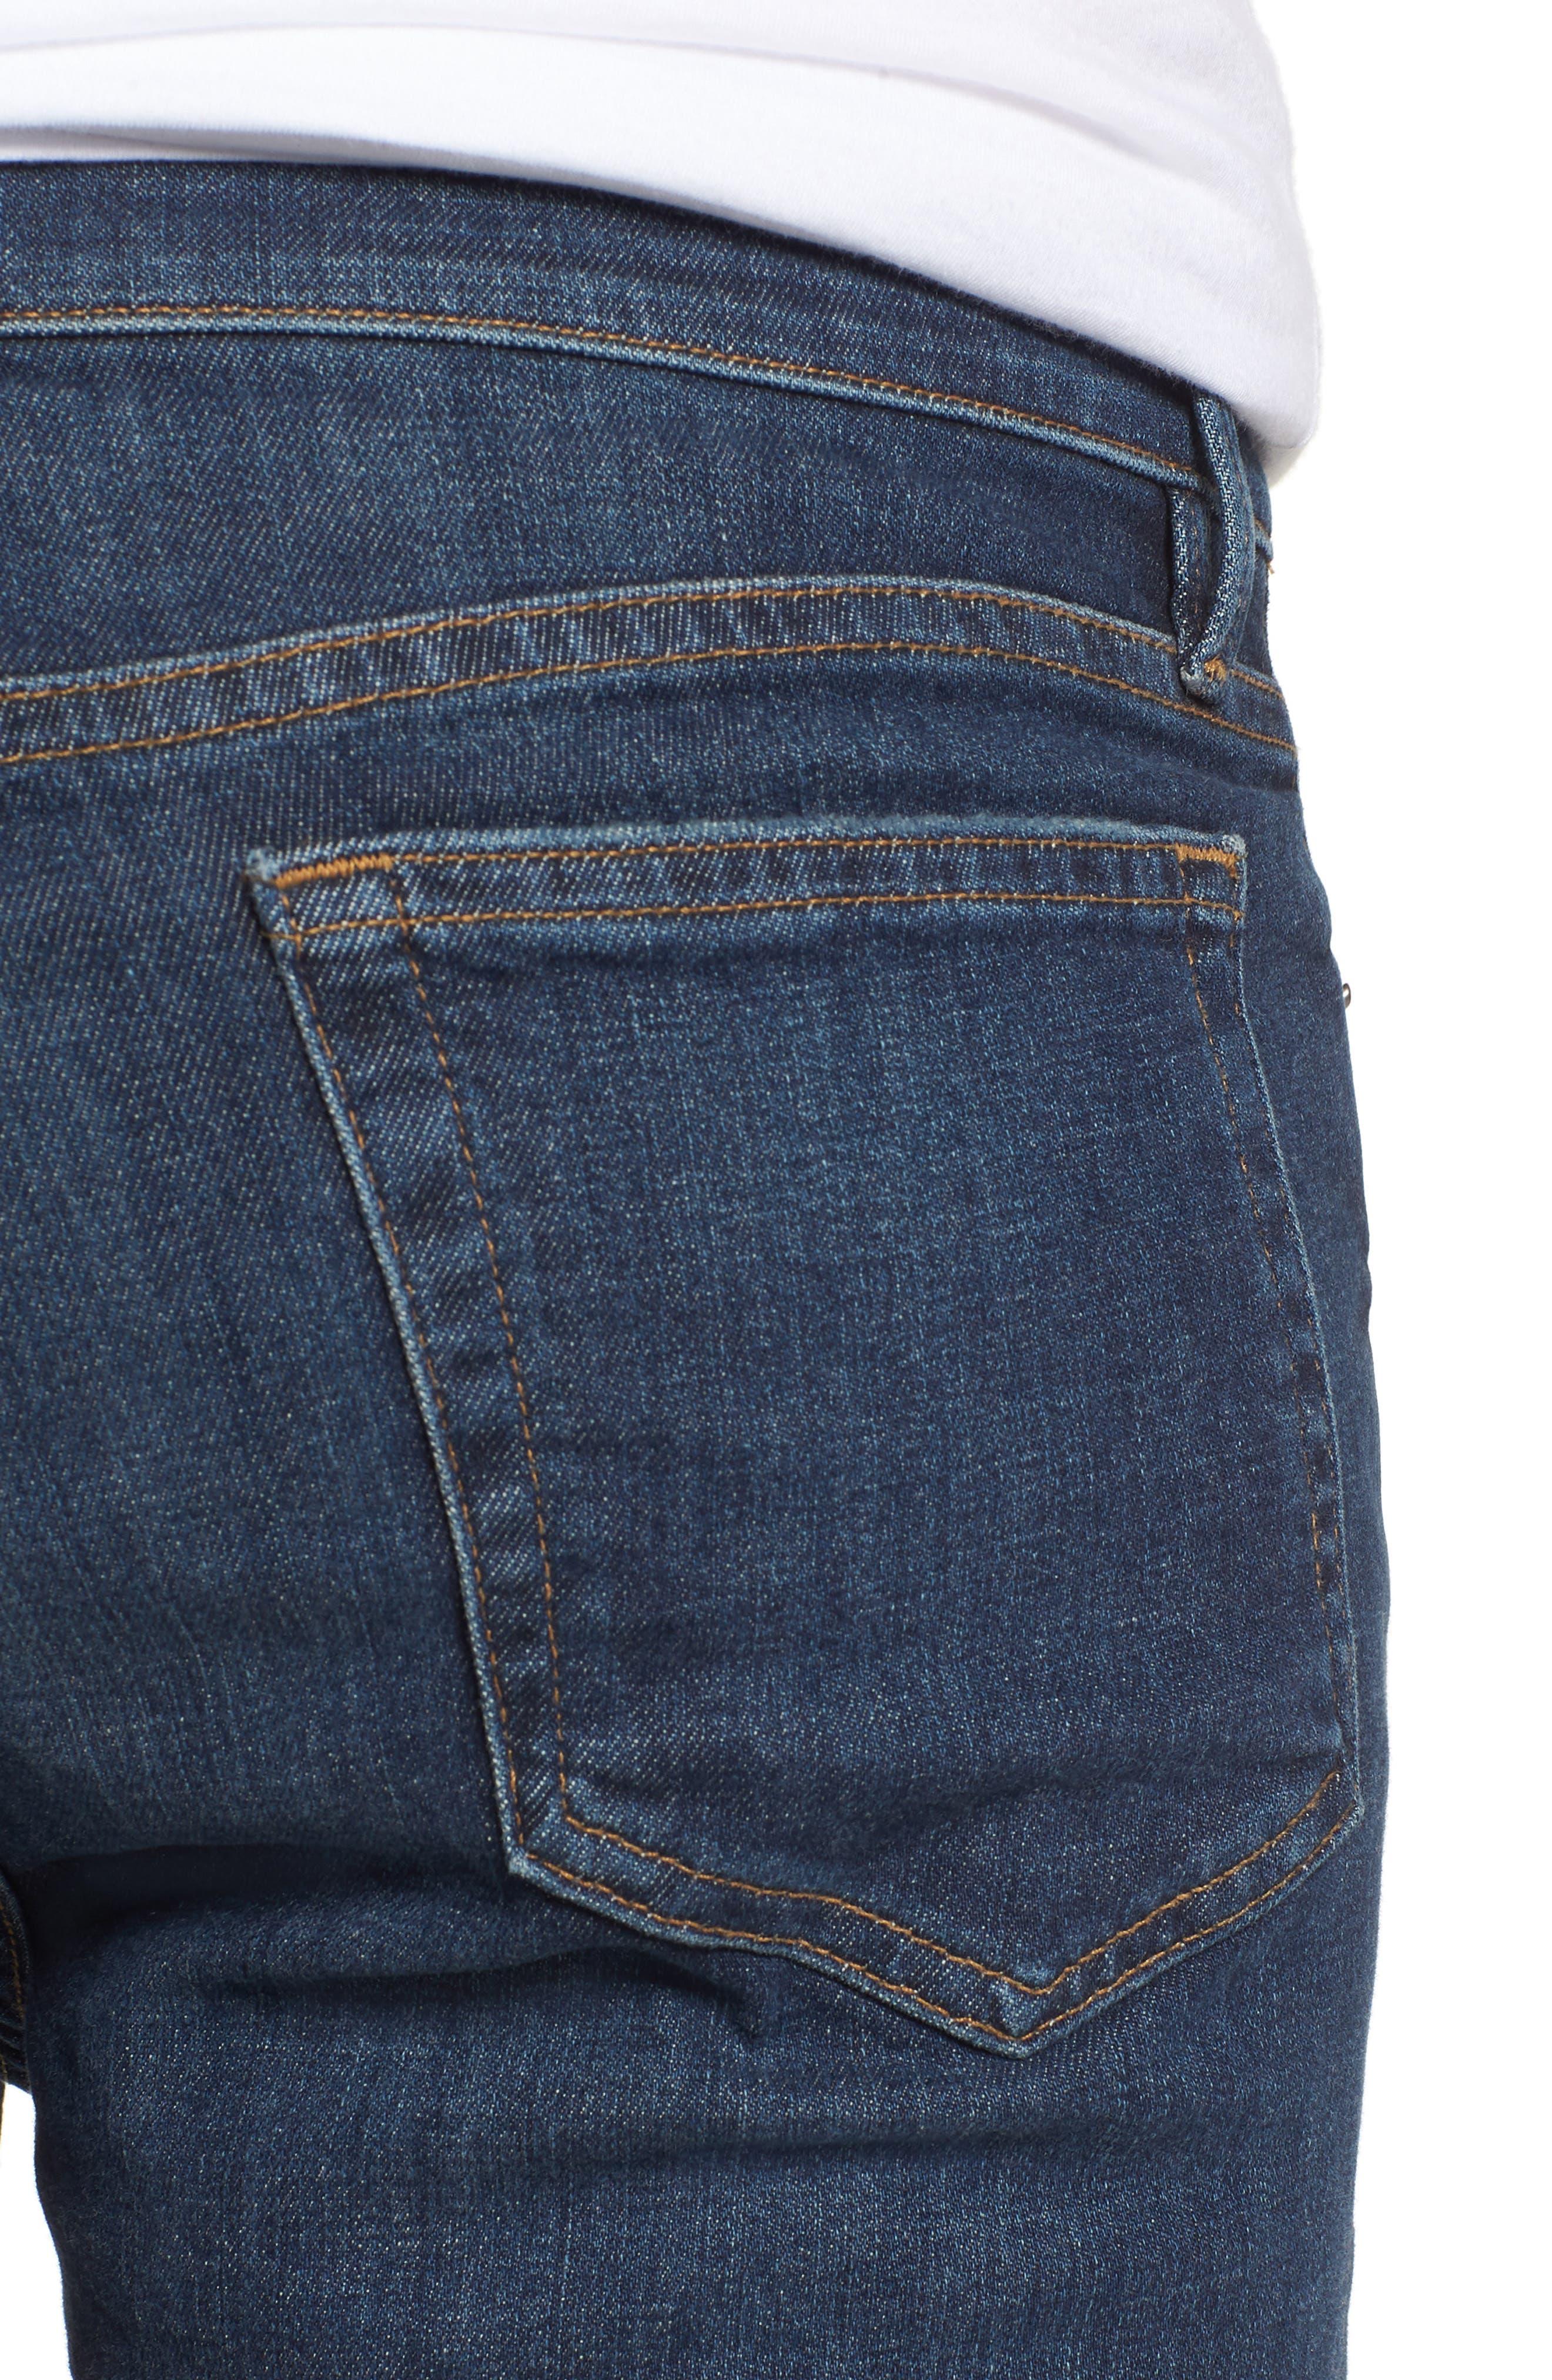 L'Homme Skinny Jeans,                             Alternate thumbnail 4, color,                             Loris